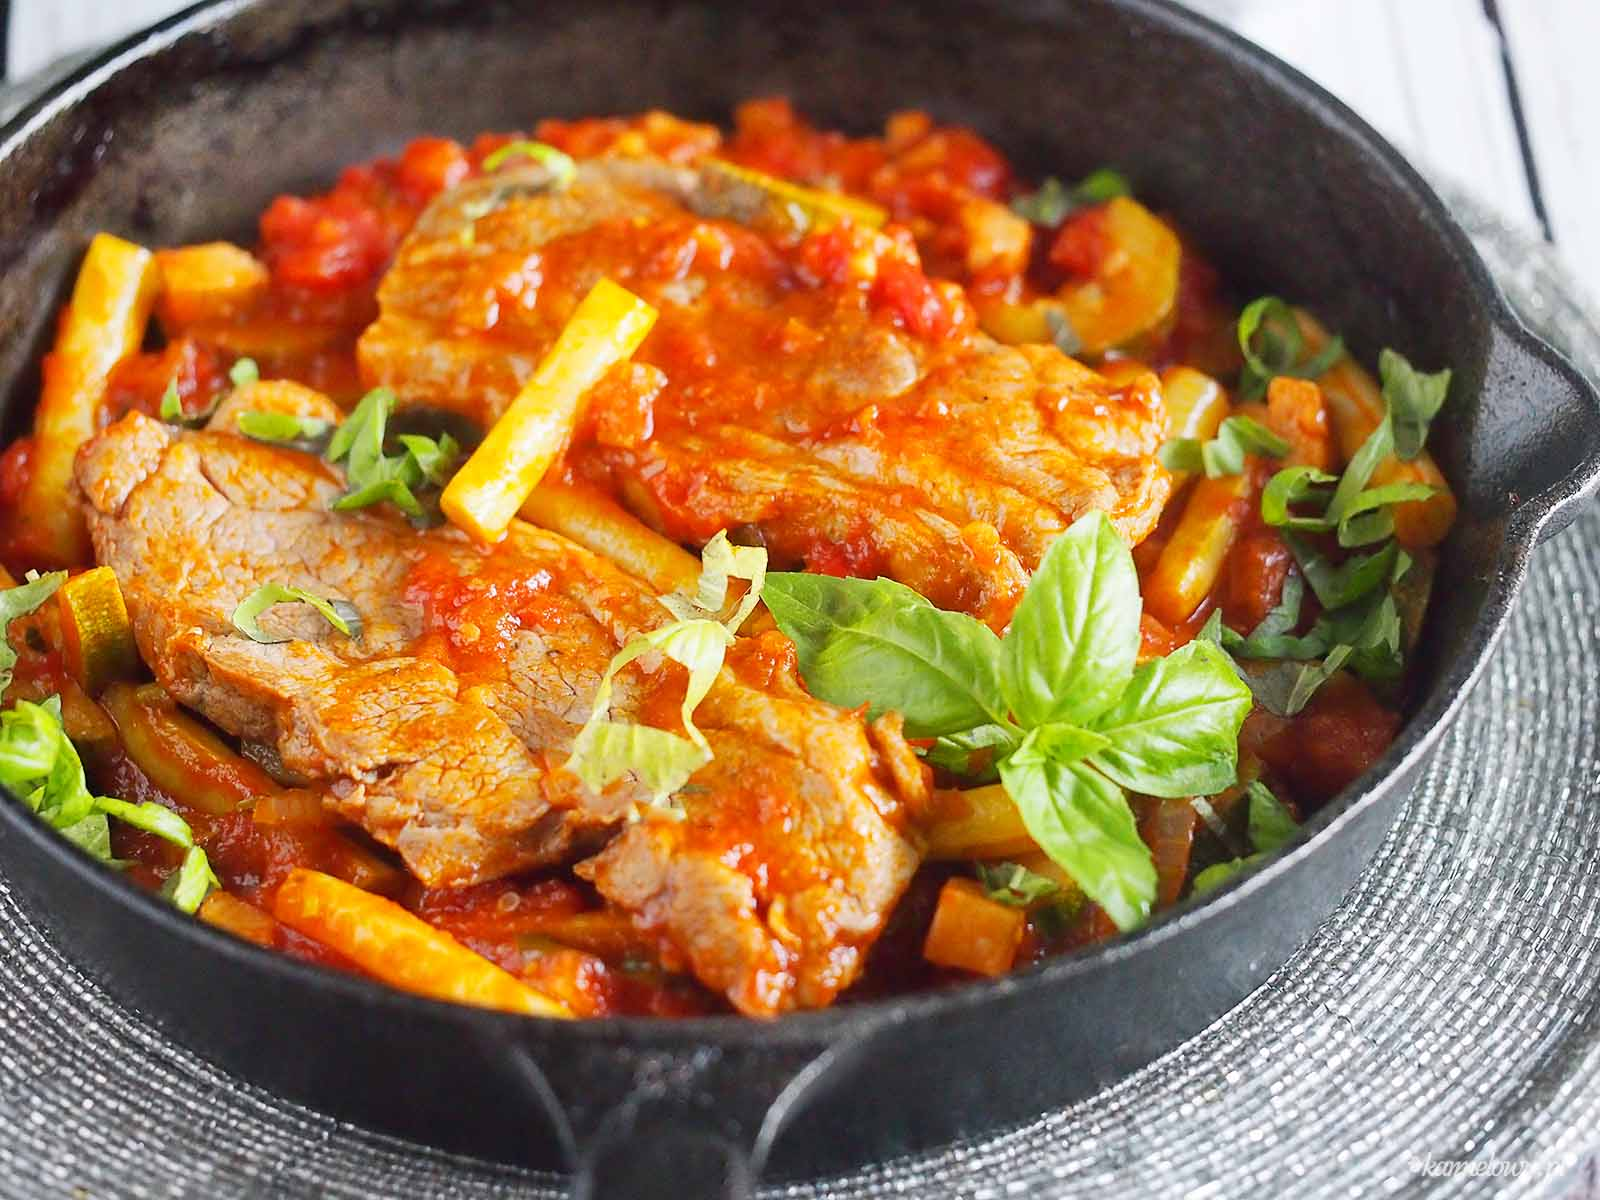 Jagniecina-z-cukinia-i-fasolka-szparagowa-Lamb-with-zucchini-and-green-beans